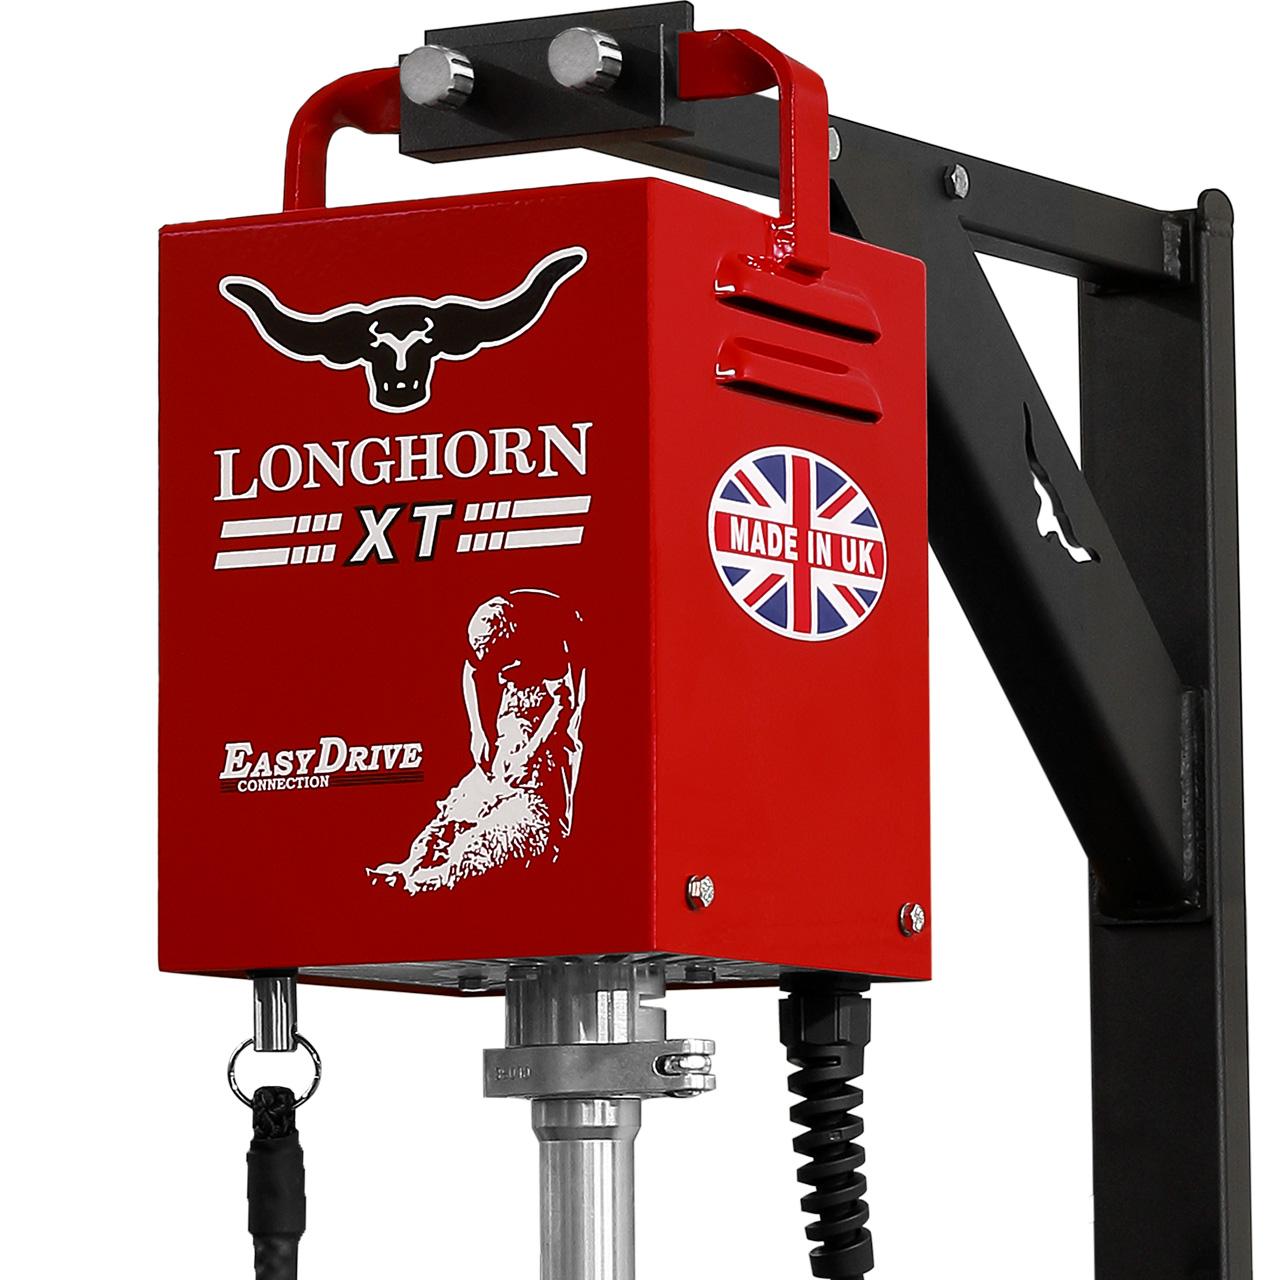 Longhorn® XT WORM